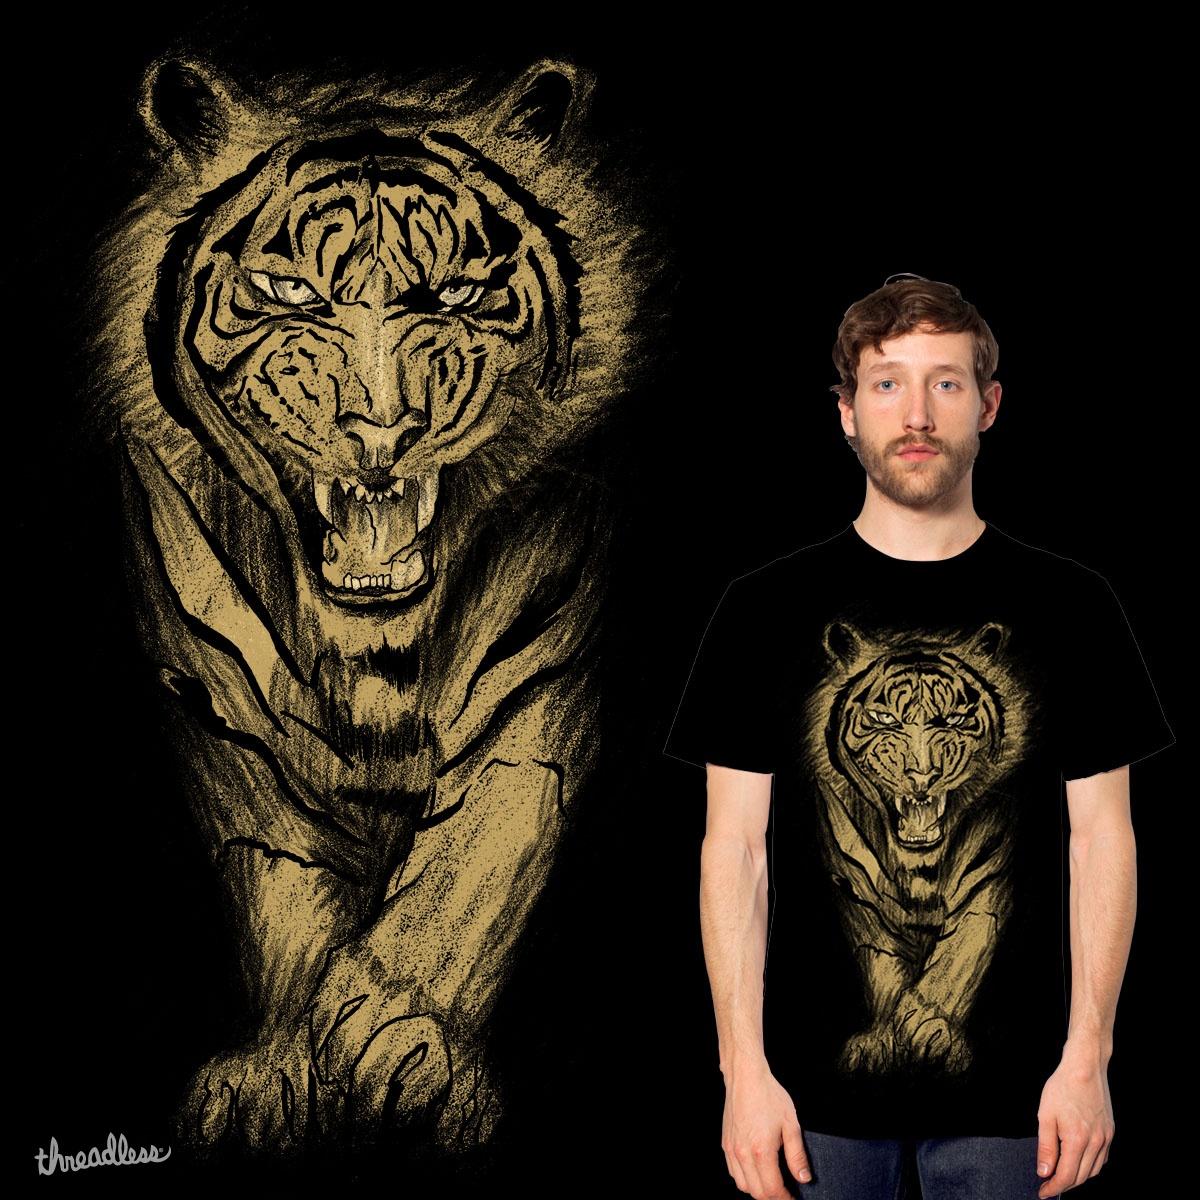 Tigers roar by gupikus on Threadless